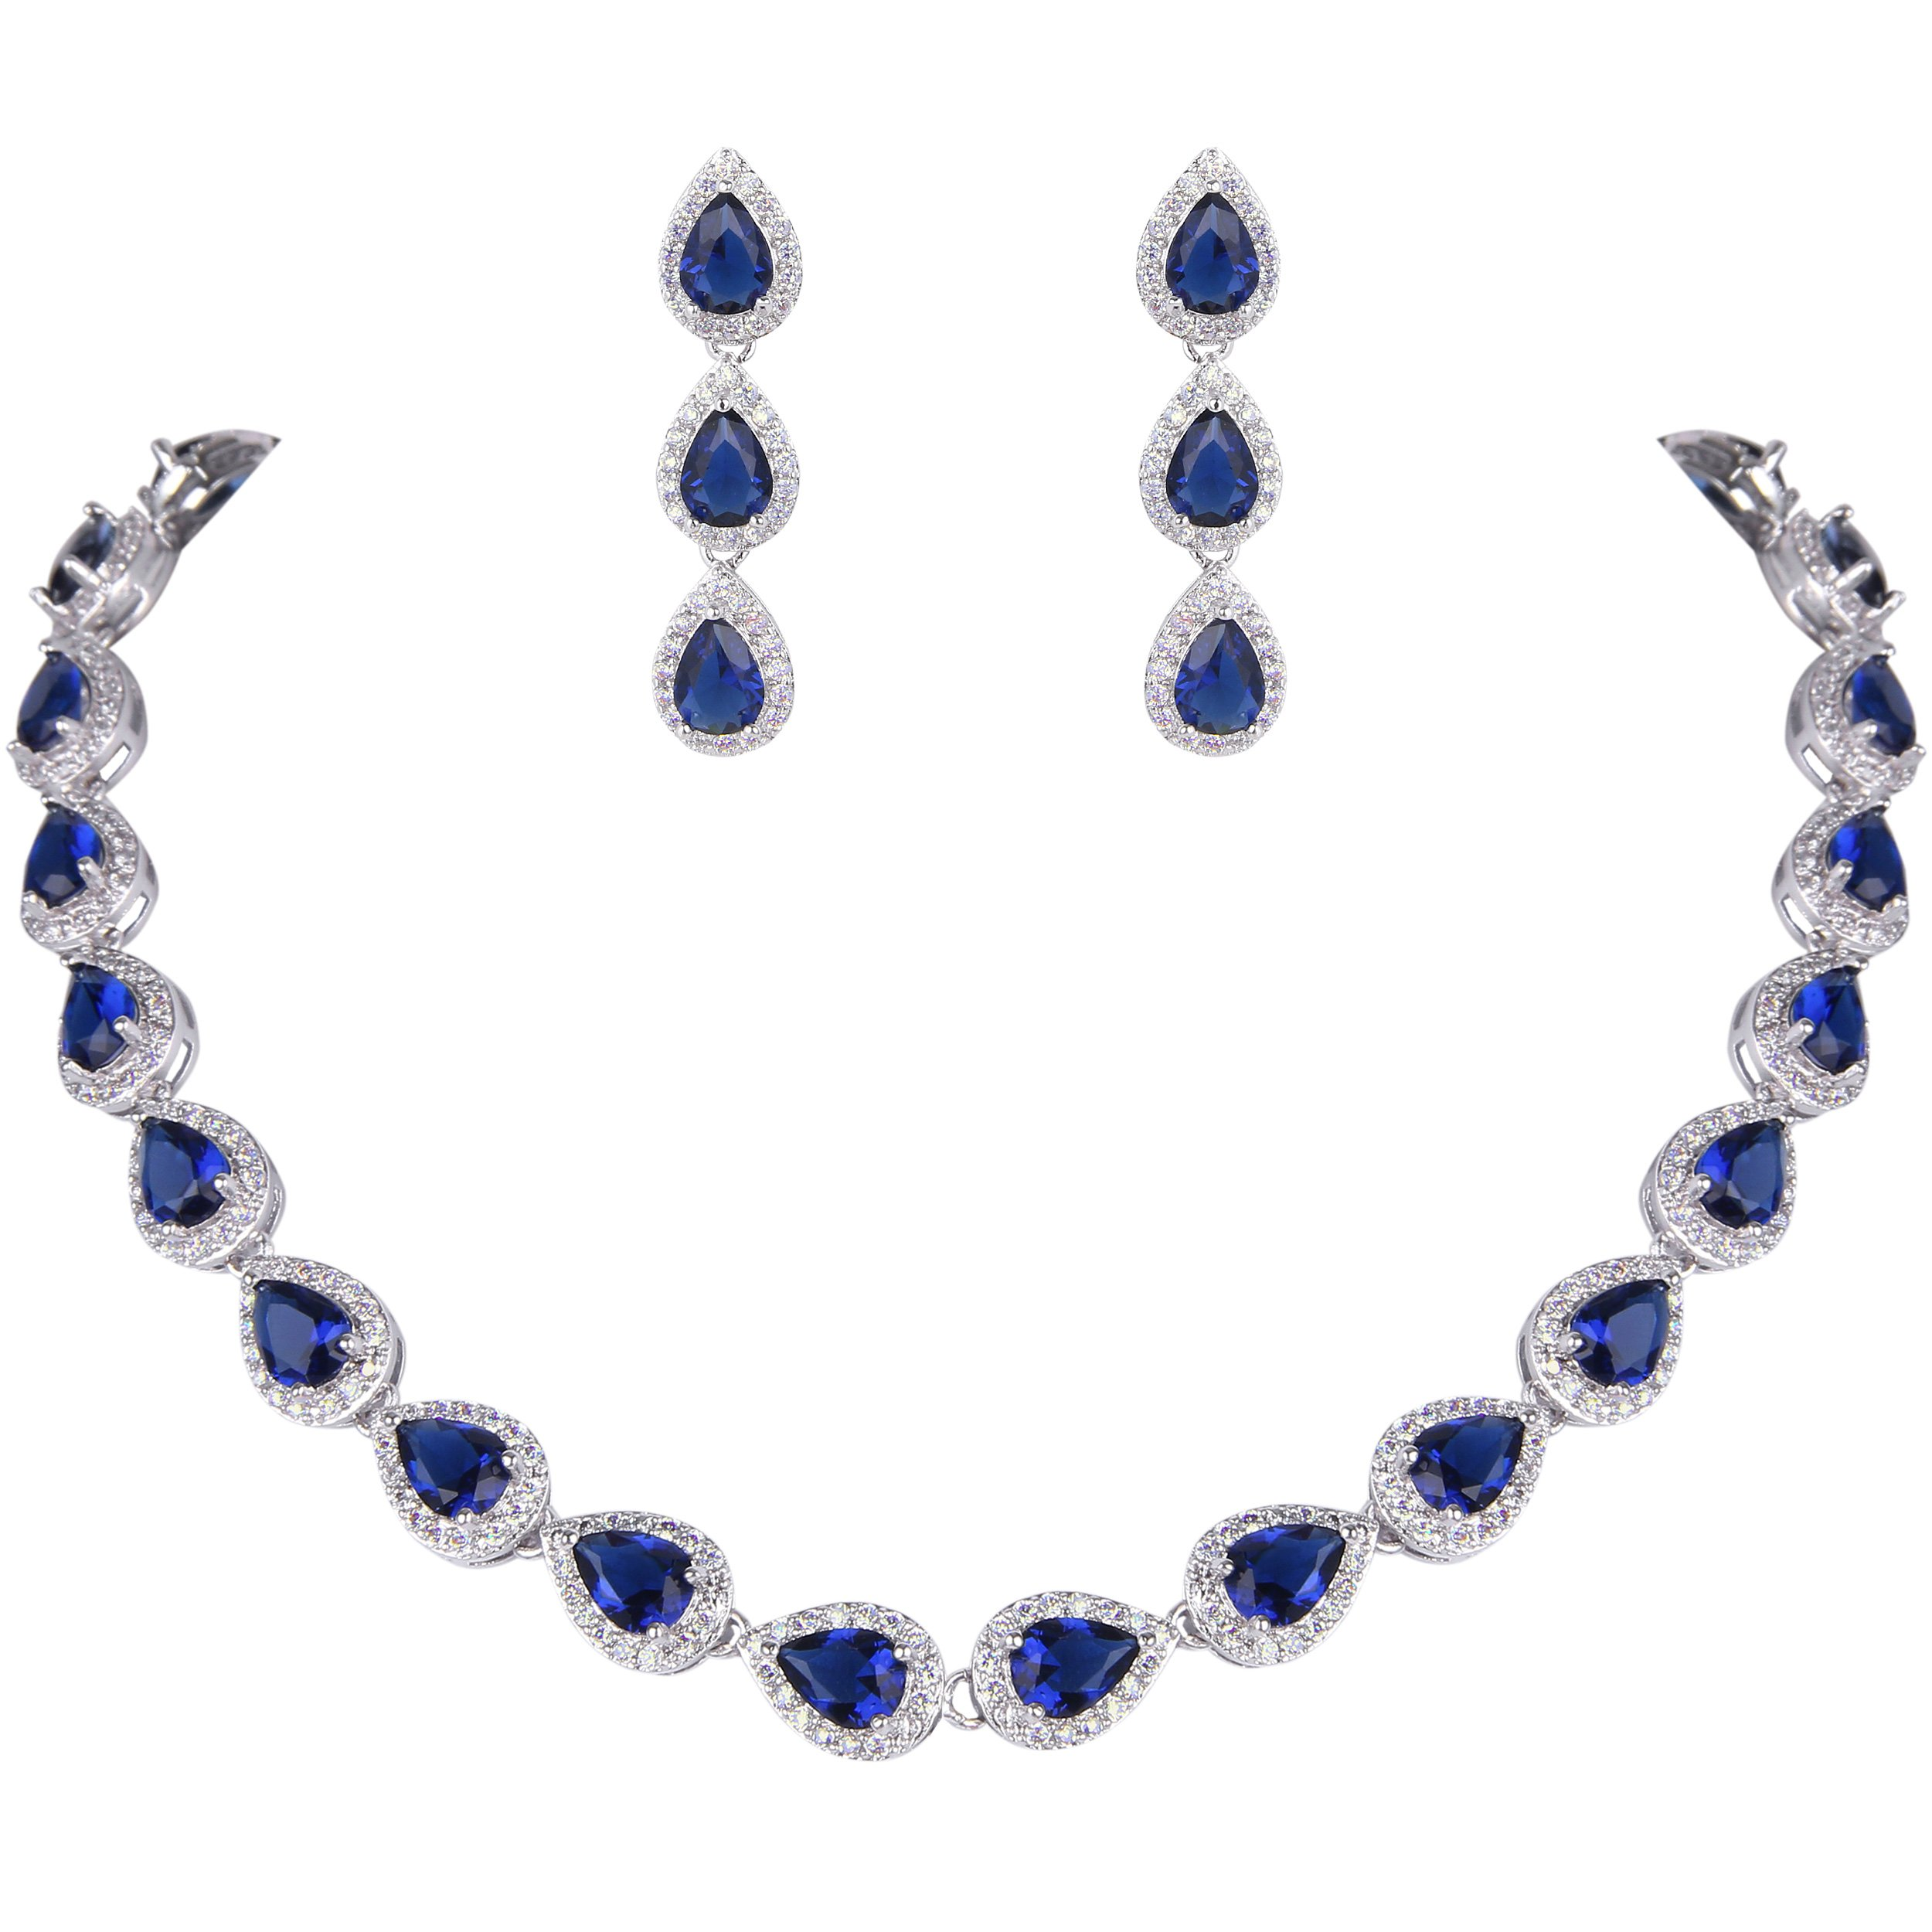 EVER FAITH Women's Full CZ Elegant Teardrop Necklace Earrings Set Blue Sapphire Color Silver-Tone